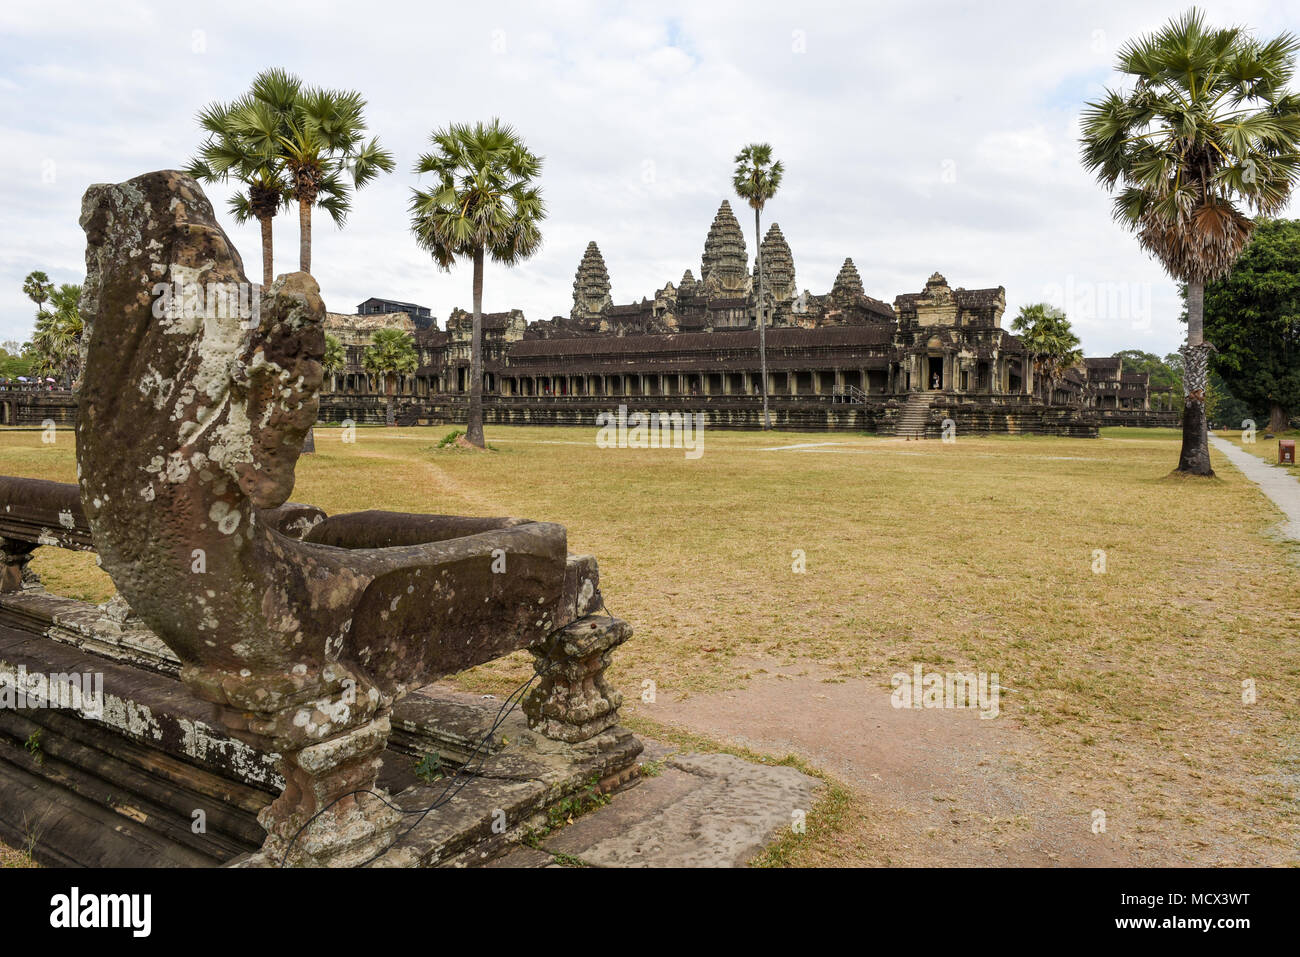 Templo de Angkor Wat en Siem Reap en Camboya. Foto de stock